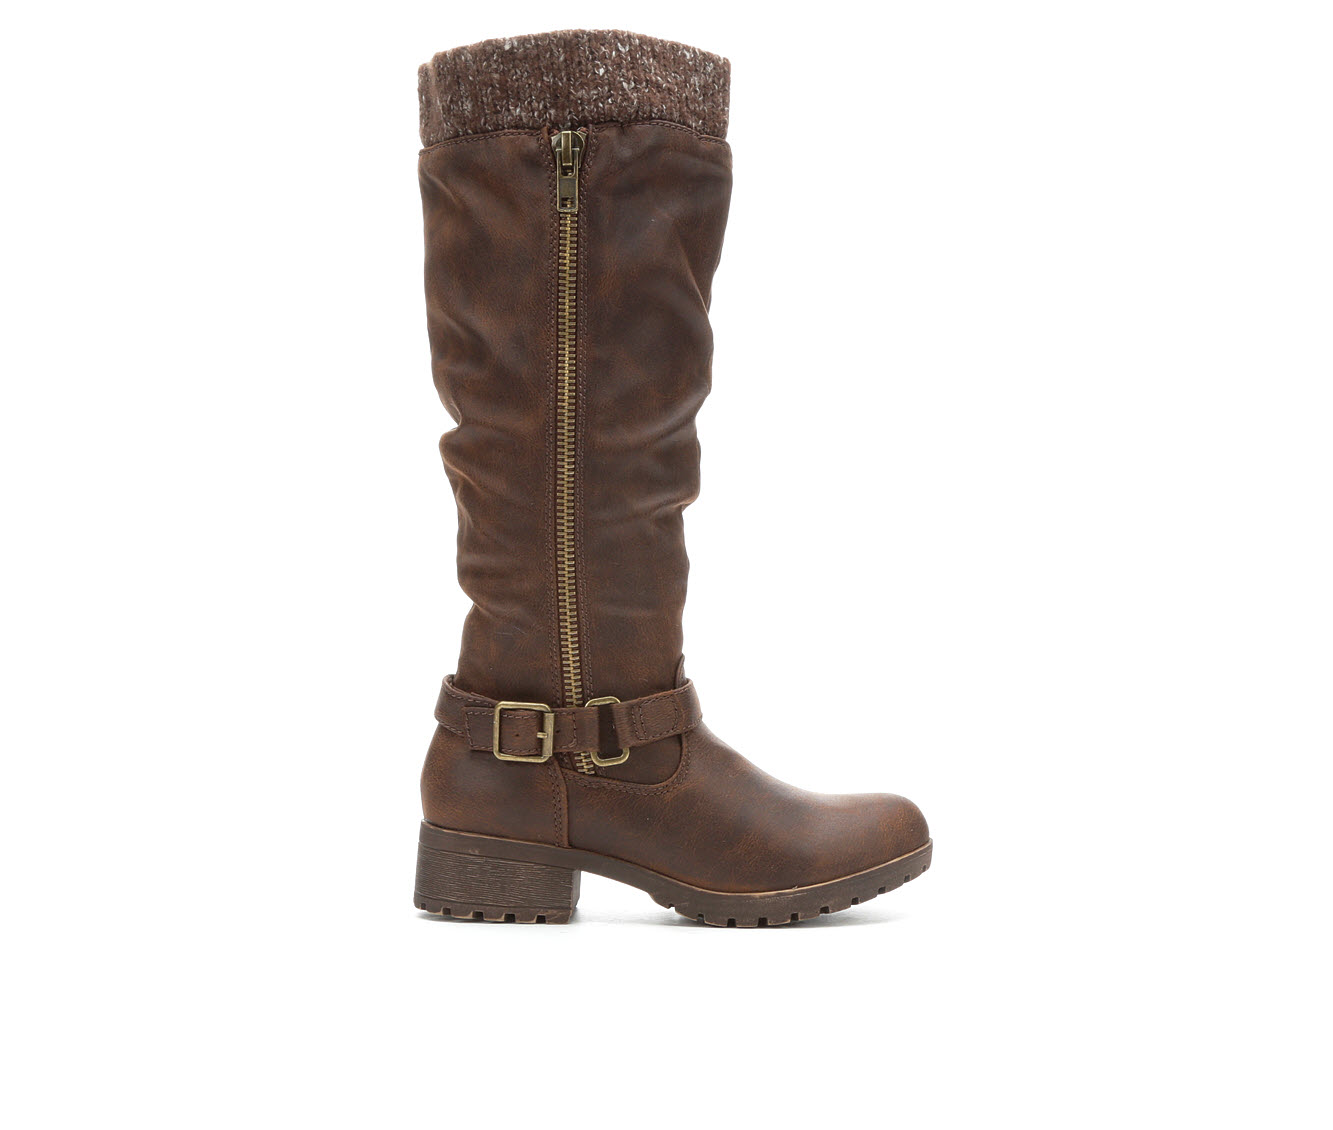 Sugar Rhubixx Women's Boot (Brown Canvas)